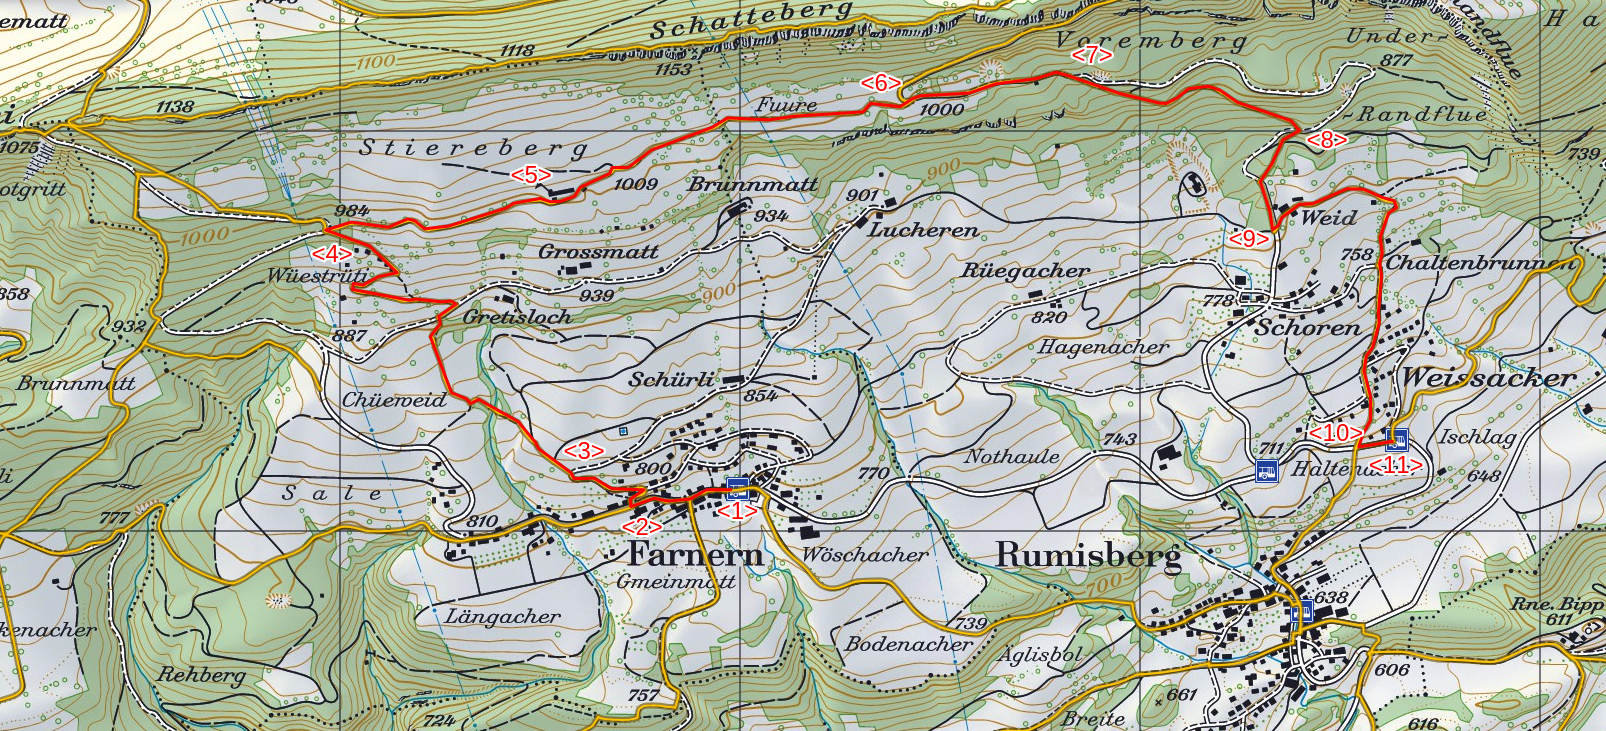 Karte Farnern-Stierenberg-Rumisberg